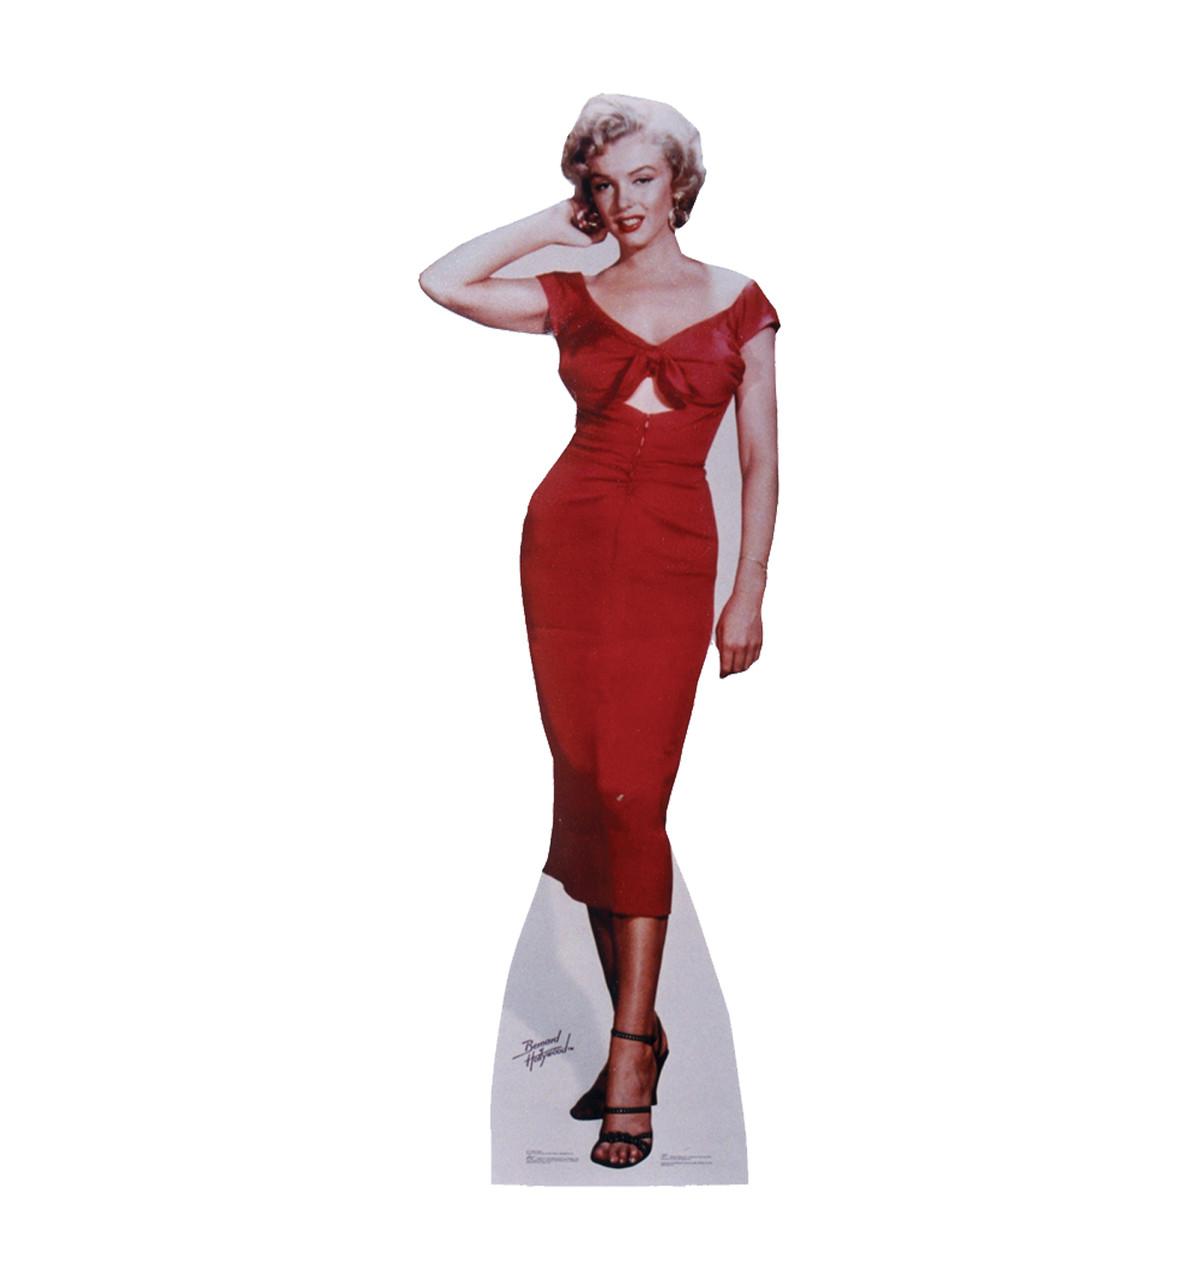 Life-size cardboard standee of Marilyn Monroe Niagara.